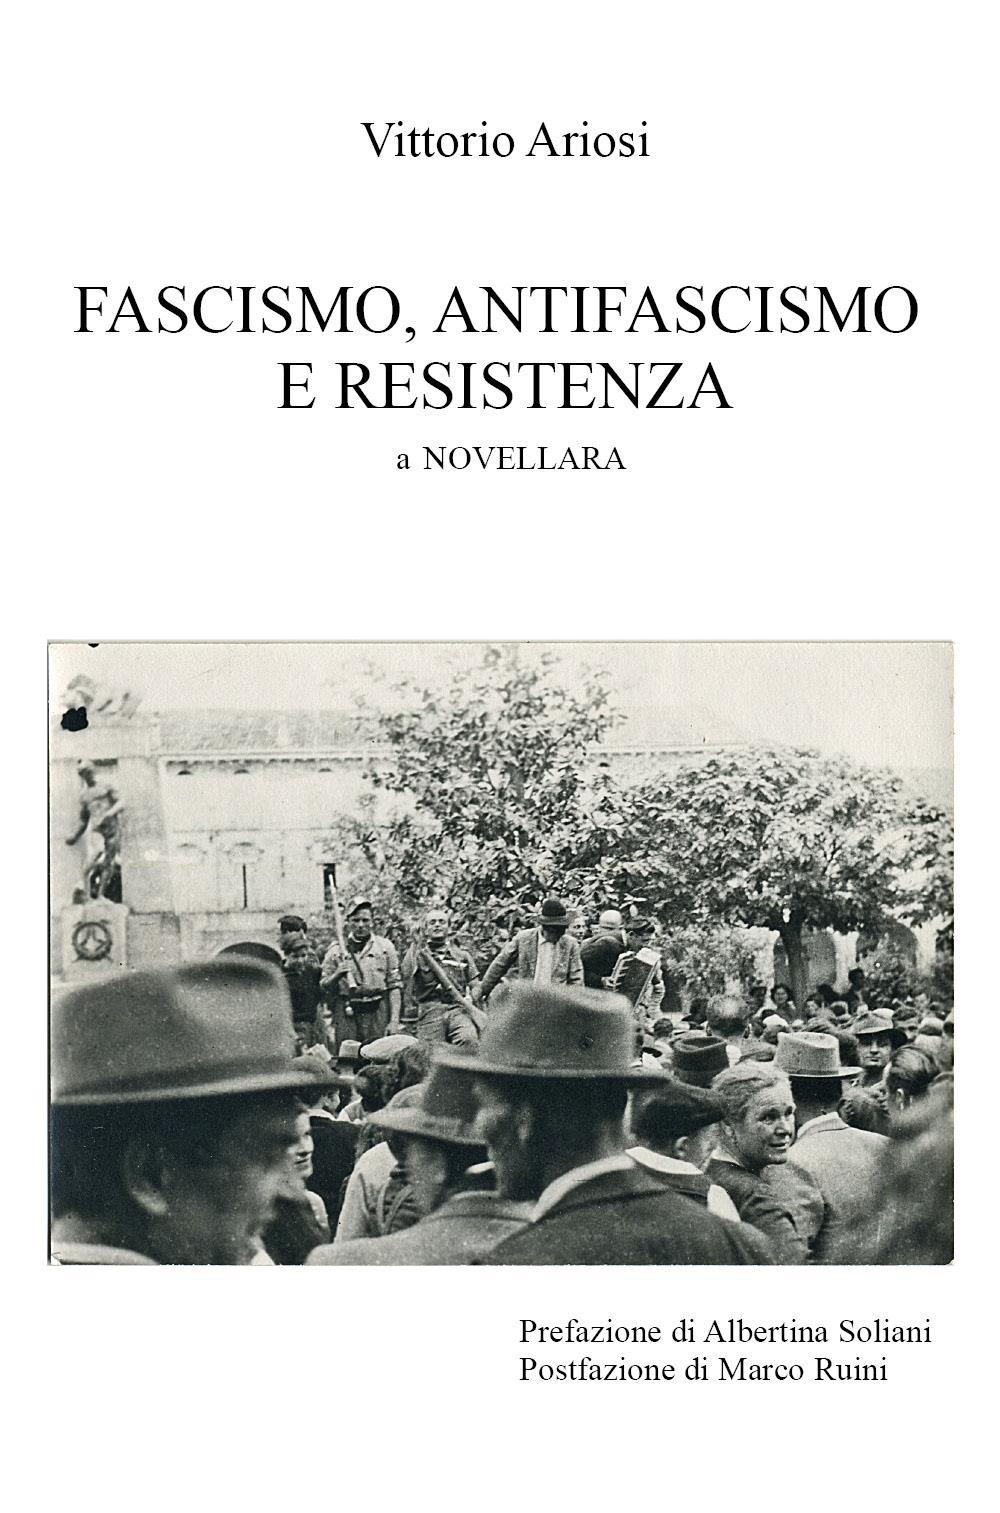 Fascismo, antifascismo e Resistenza